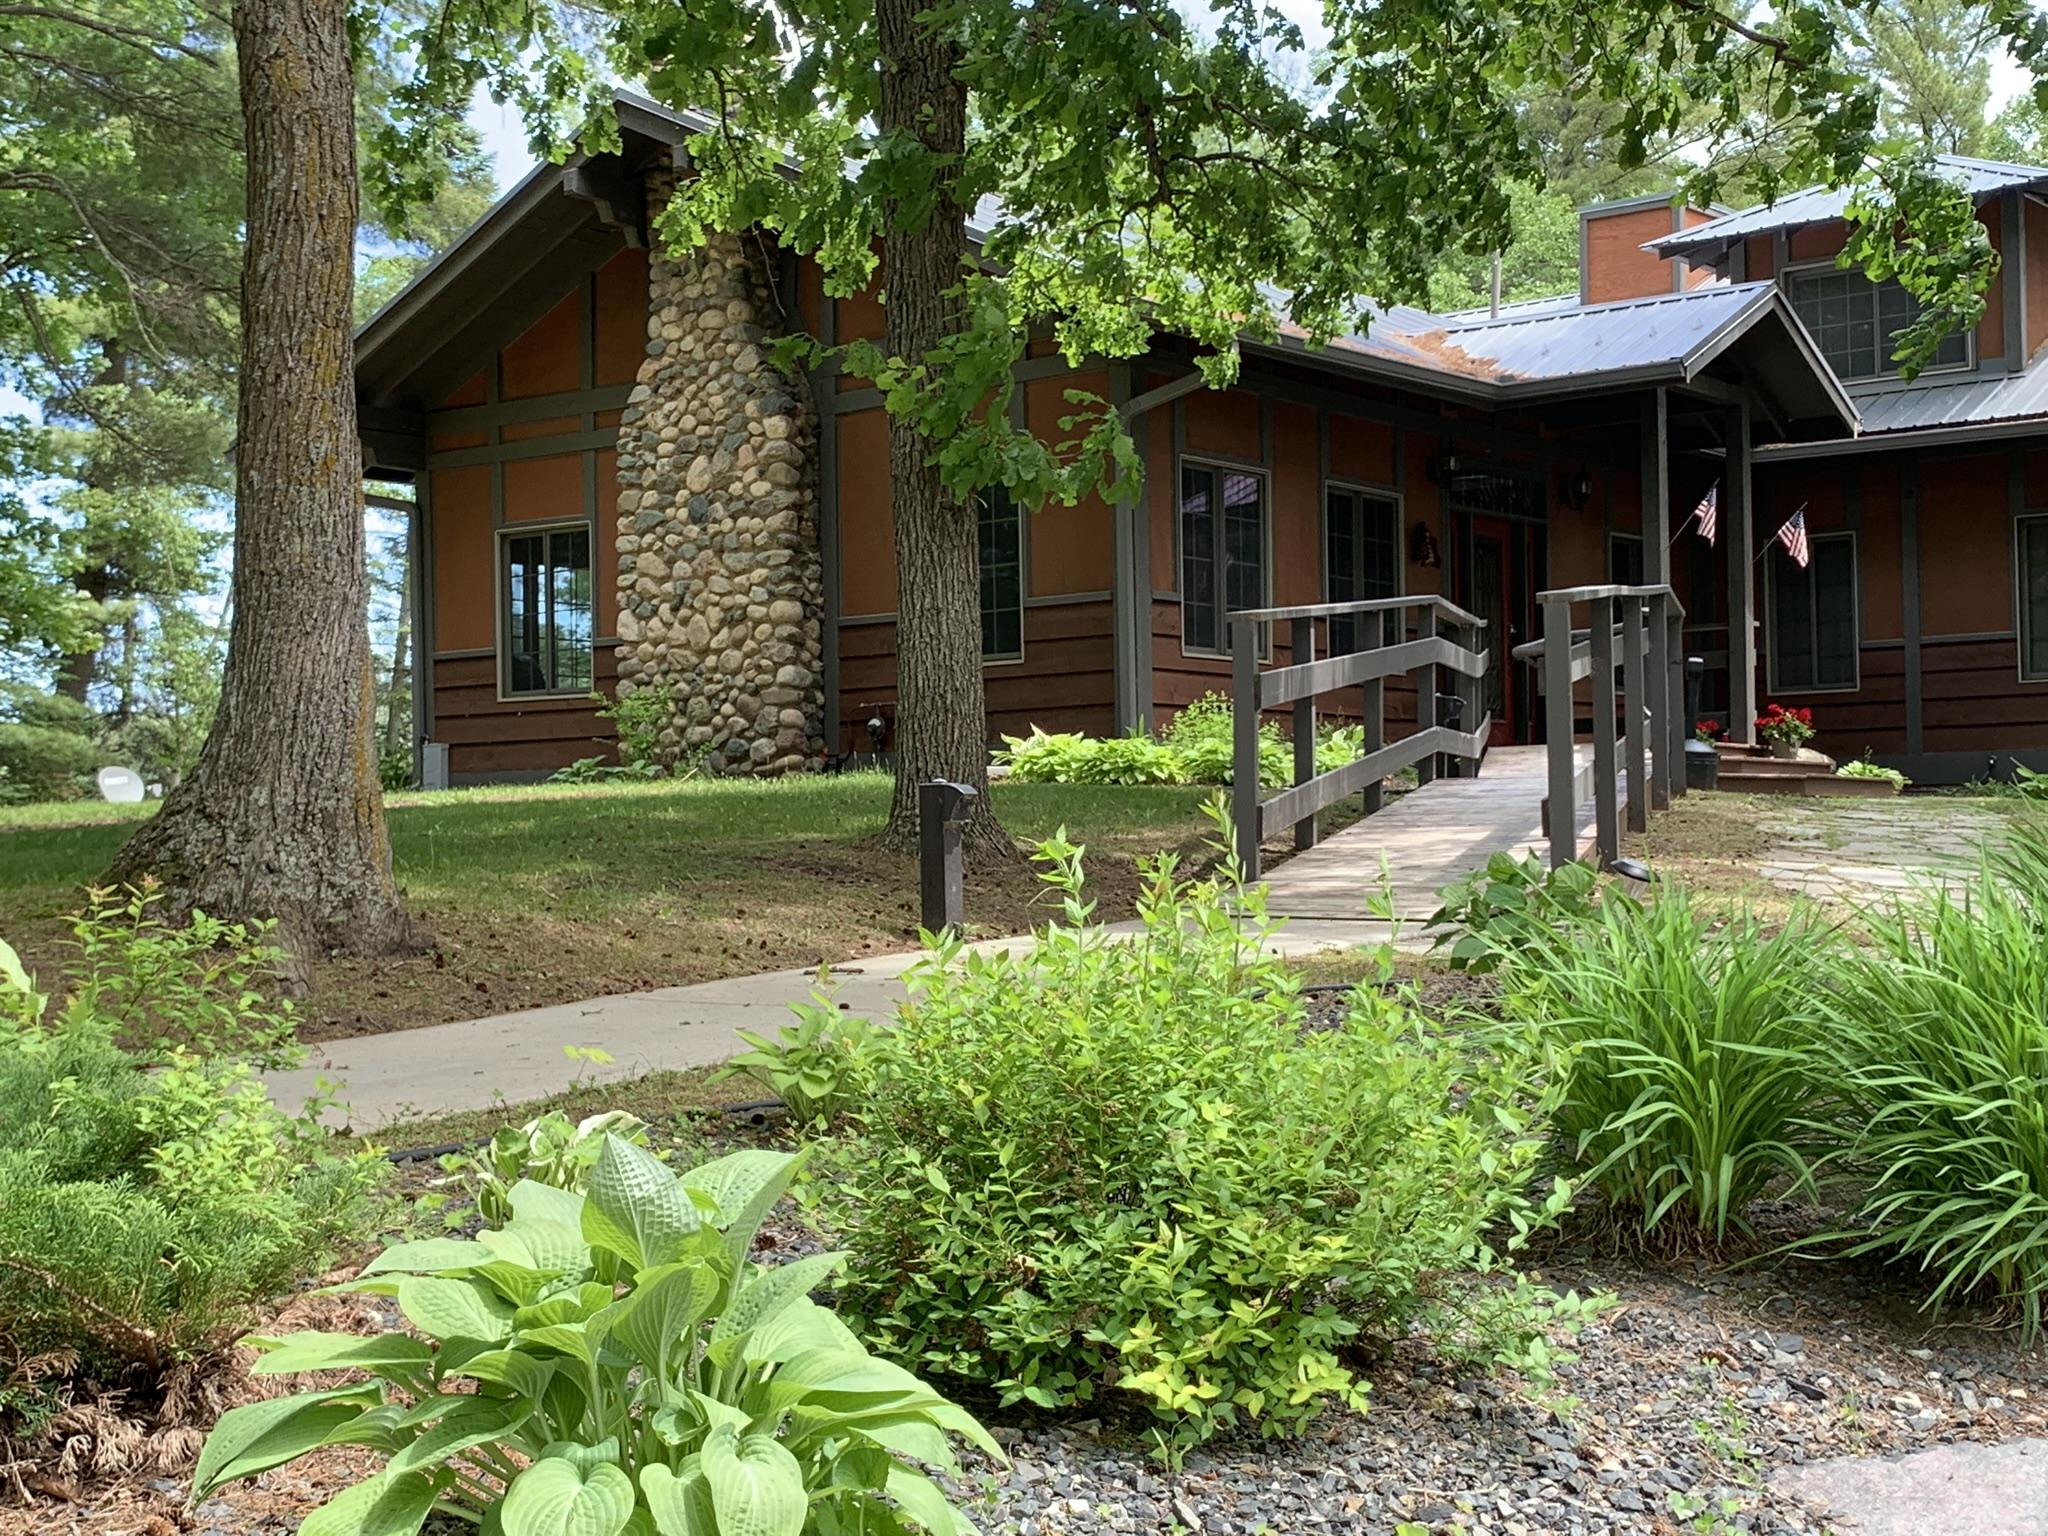 Lodge-w-ramp-and-plants